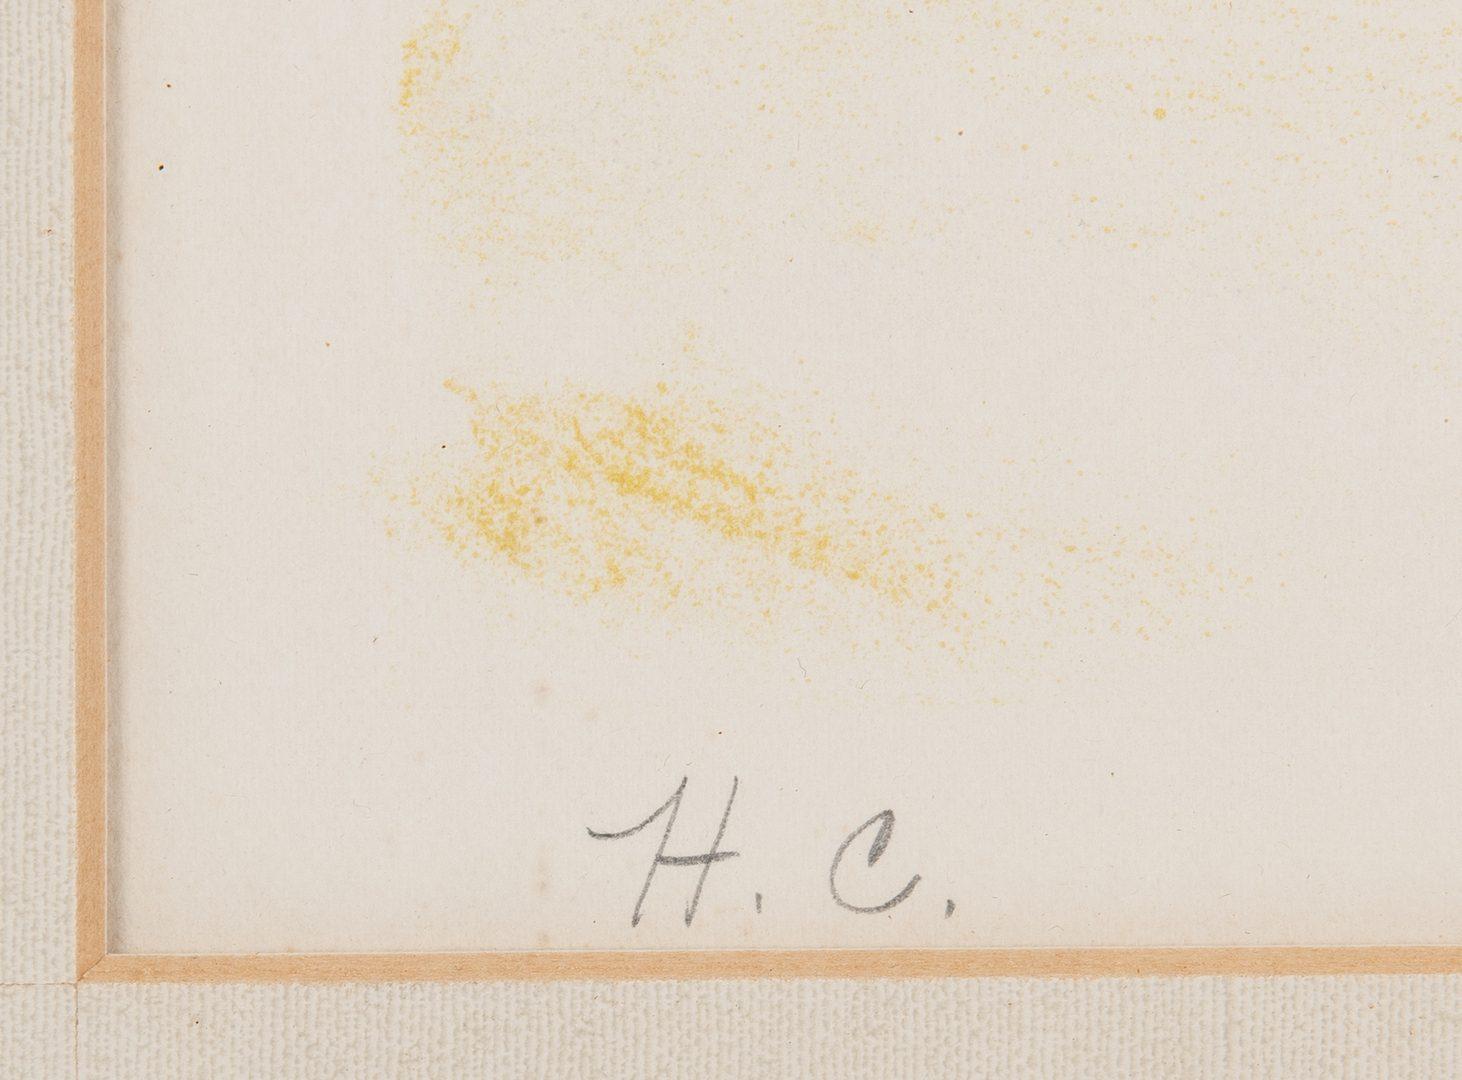 Lot 264: 3 20th Cent. French Lithographs, incl. Maurice Utrillo, Bernard Buffet